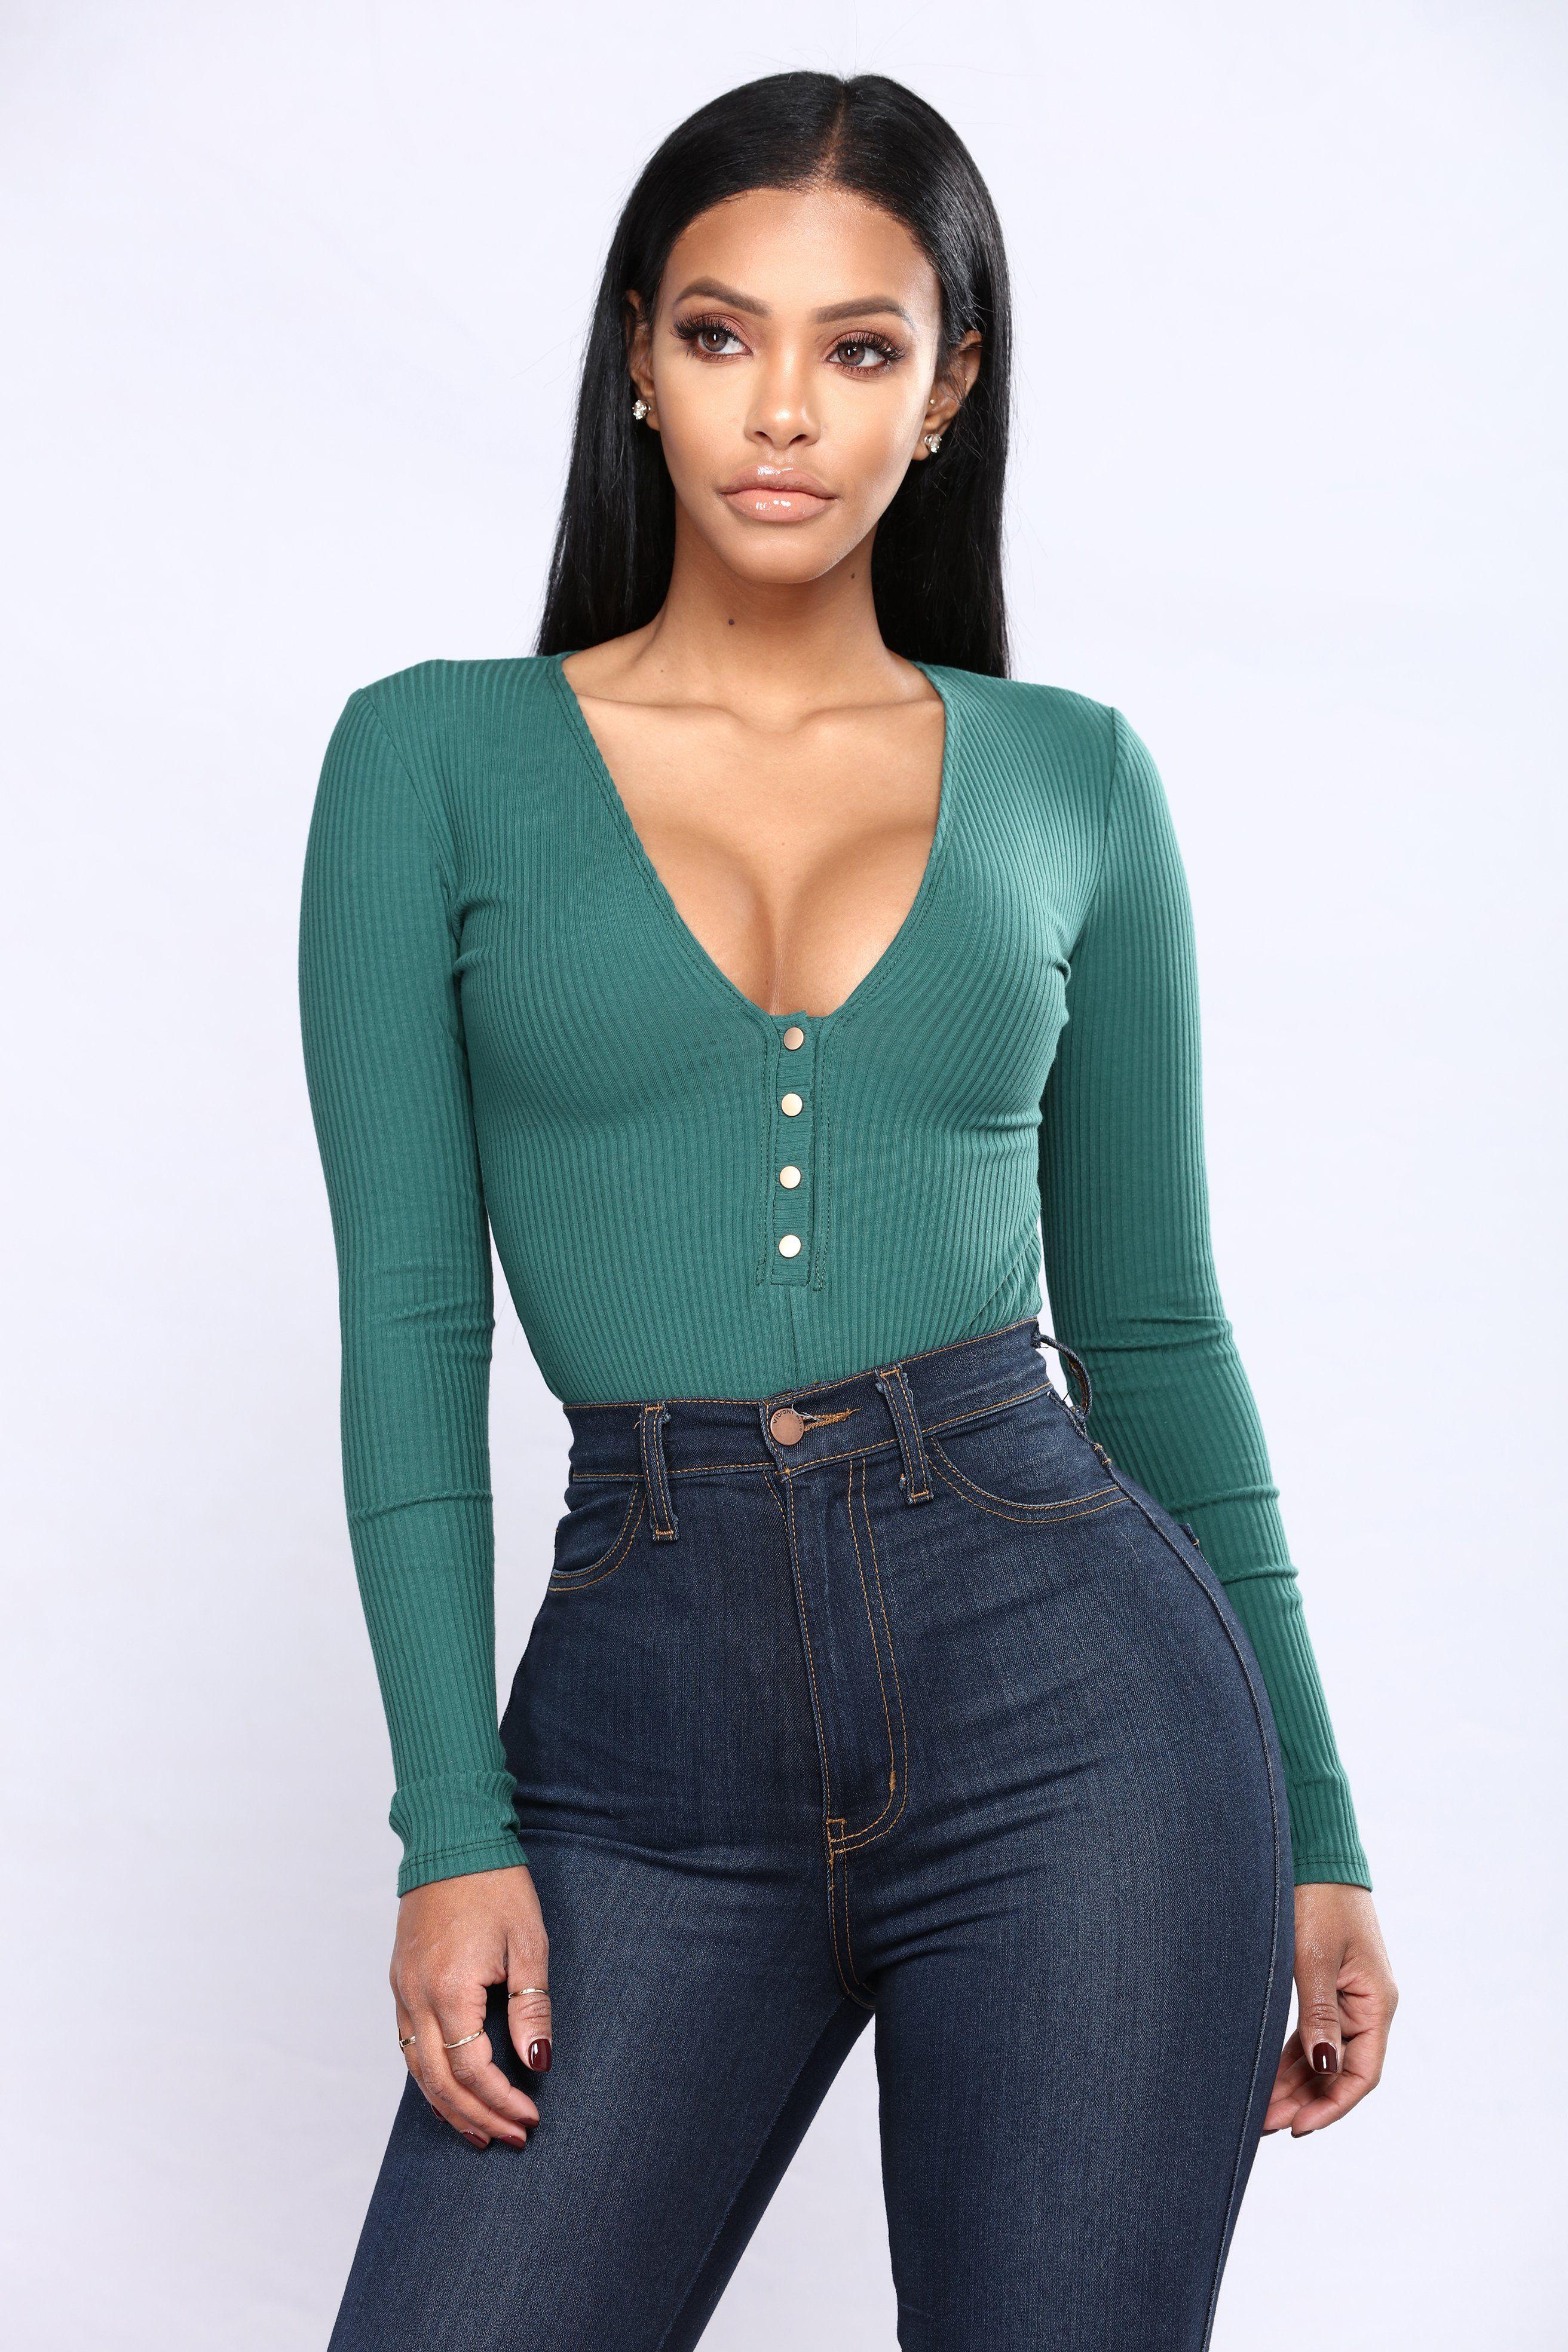 Carnaby Bodysuit Hunter Green Black women fashion